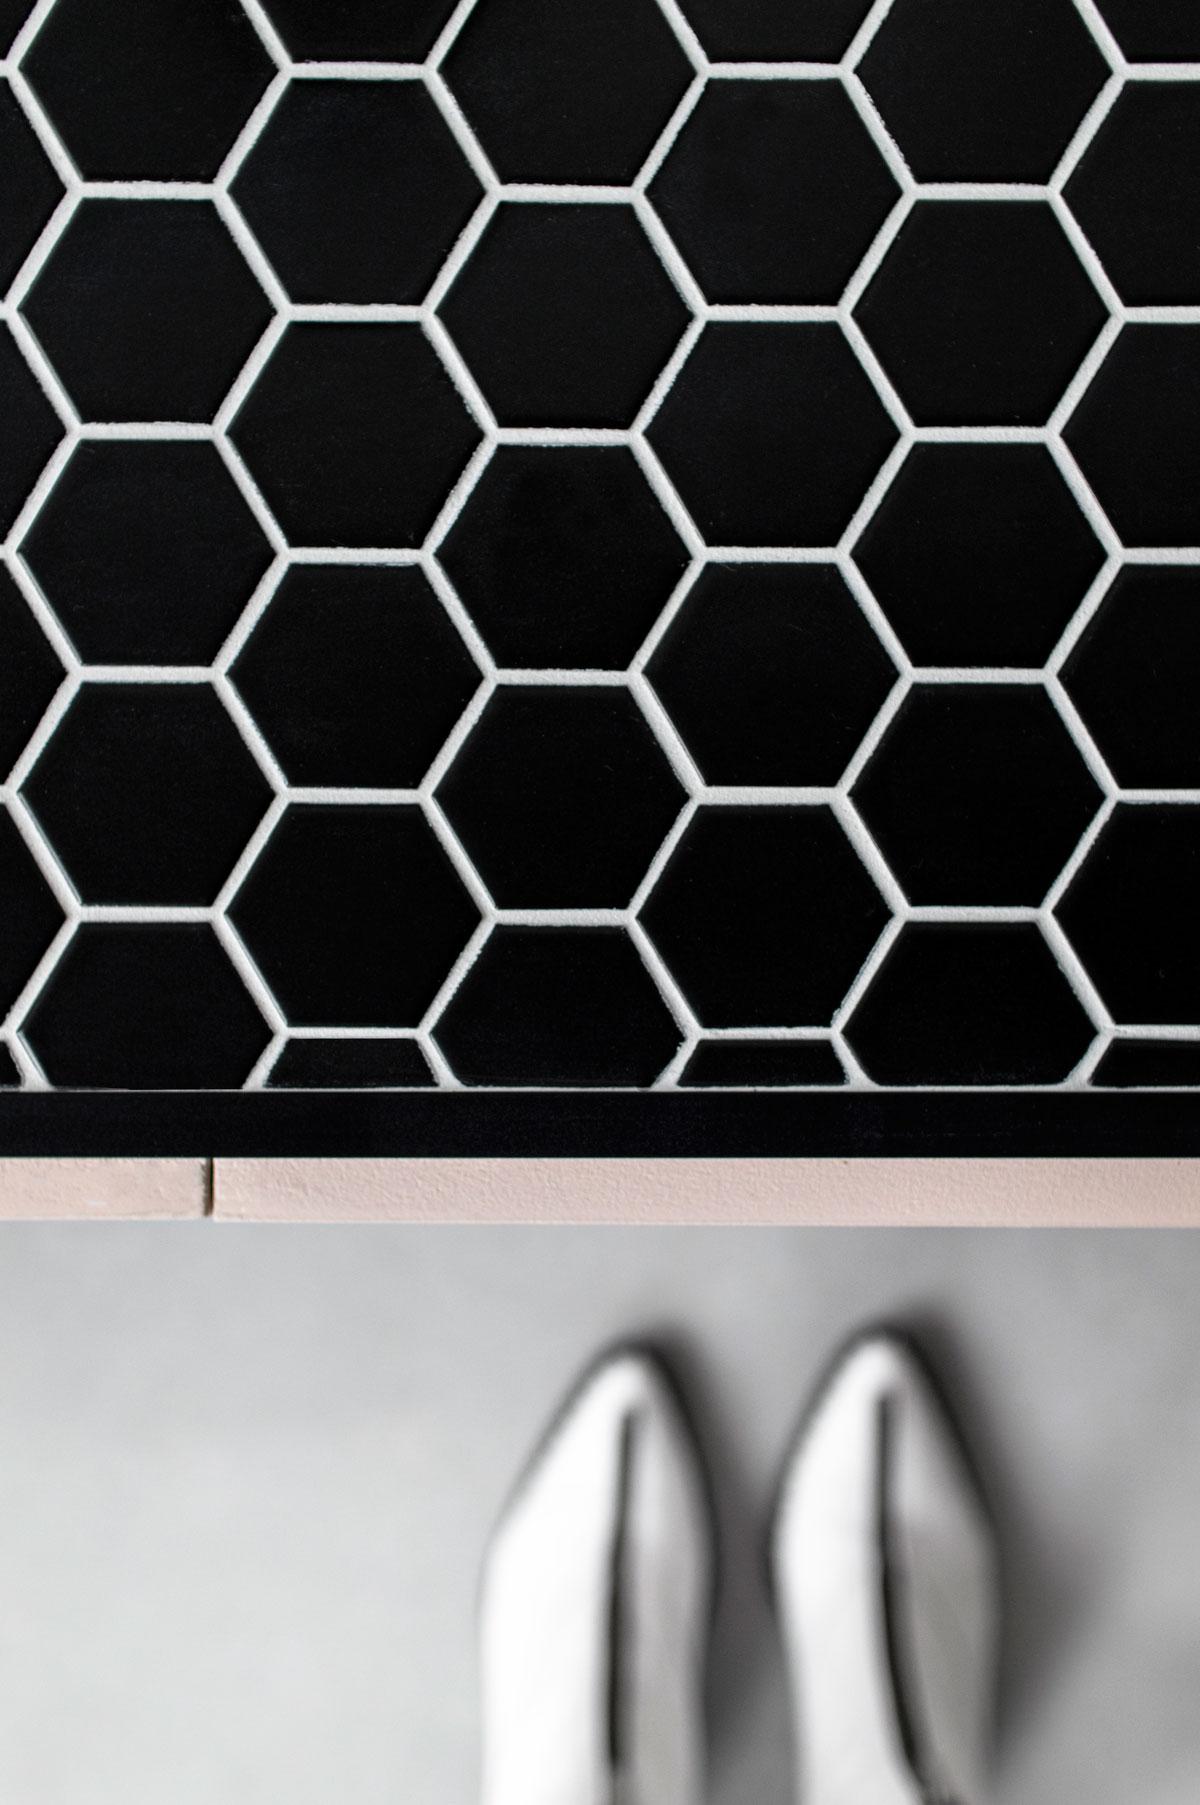 Wandmeubel hexagon tegeltjes - Tanja van Hoogdalem